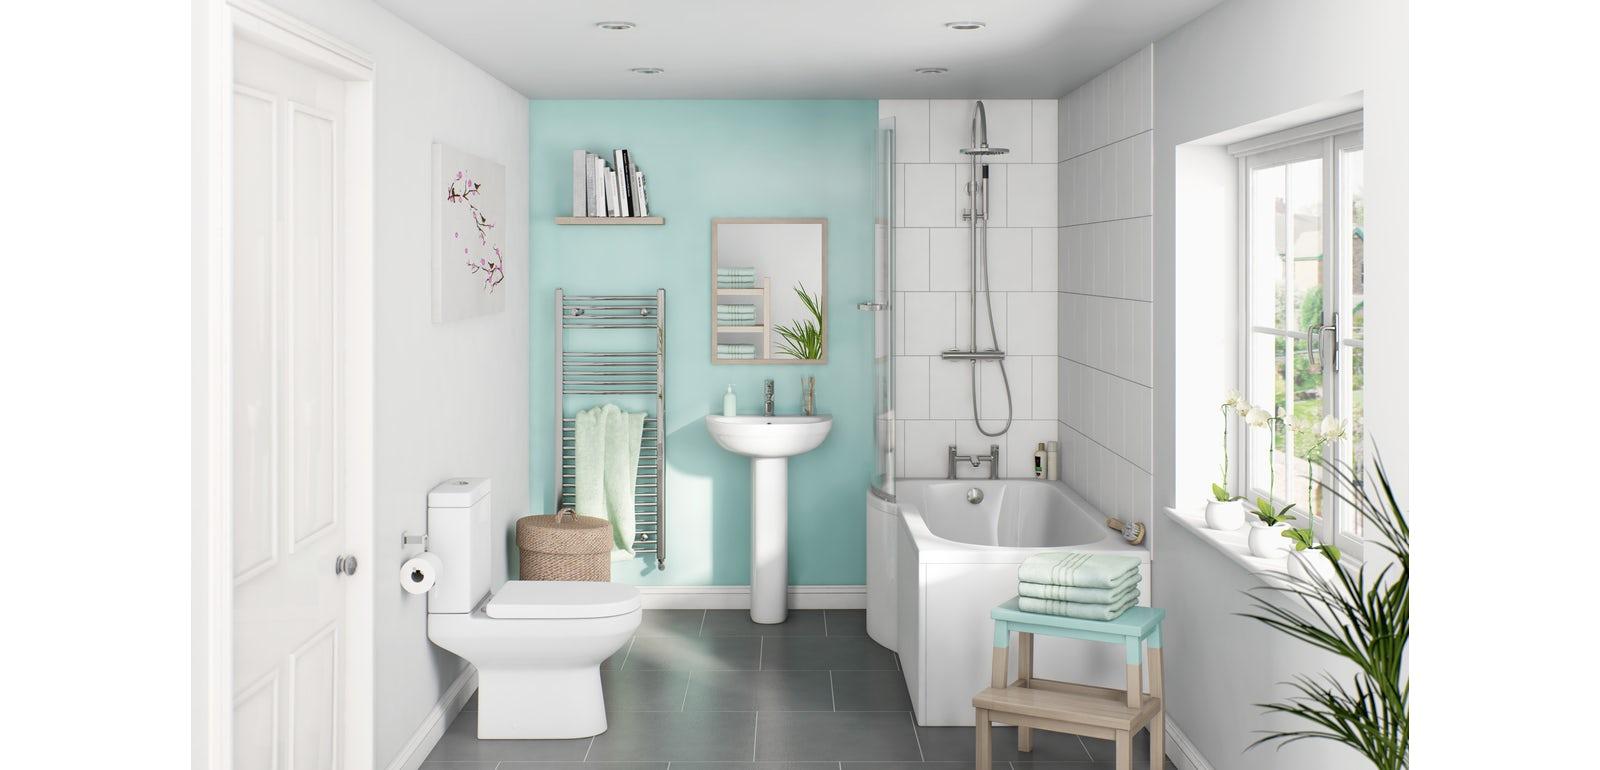 Tecaz bathroom suites - Awesome Family Bathroom Suites Guide With P Shape Bathroom Suite